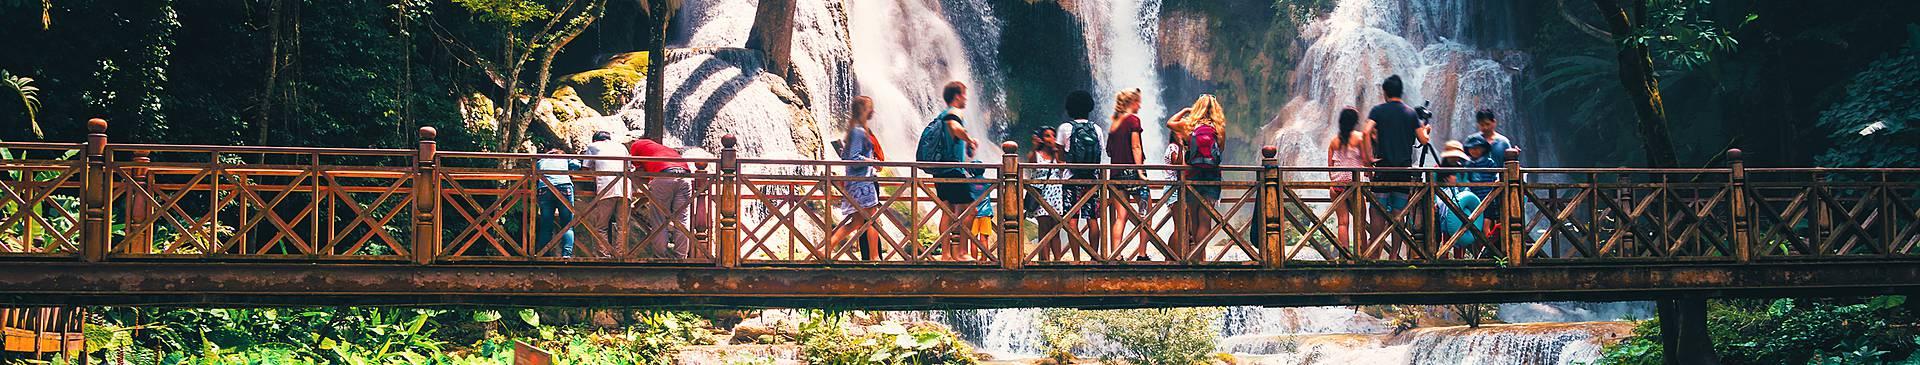 Jungle tours in Laos